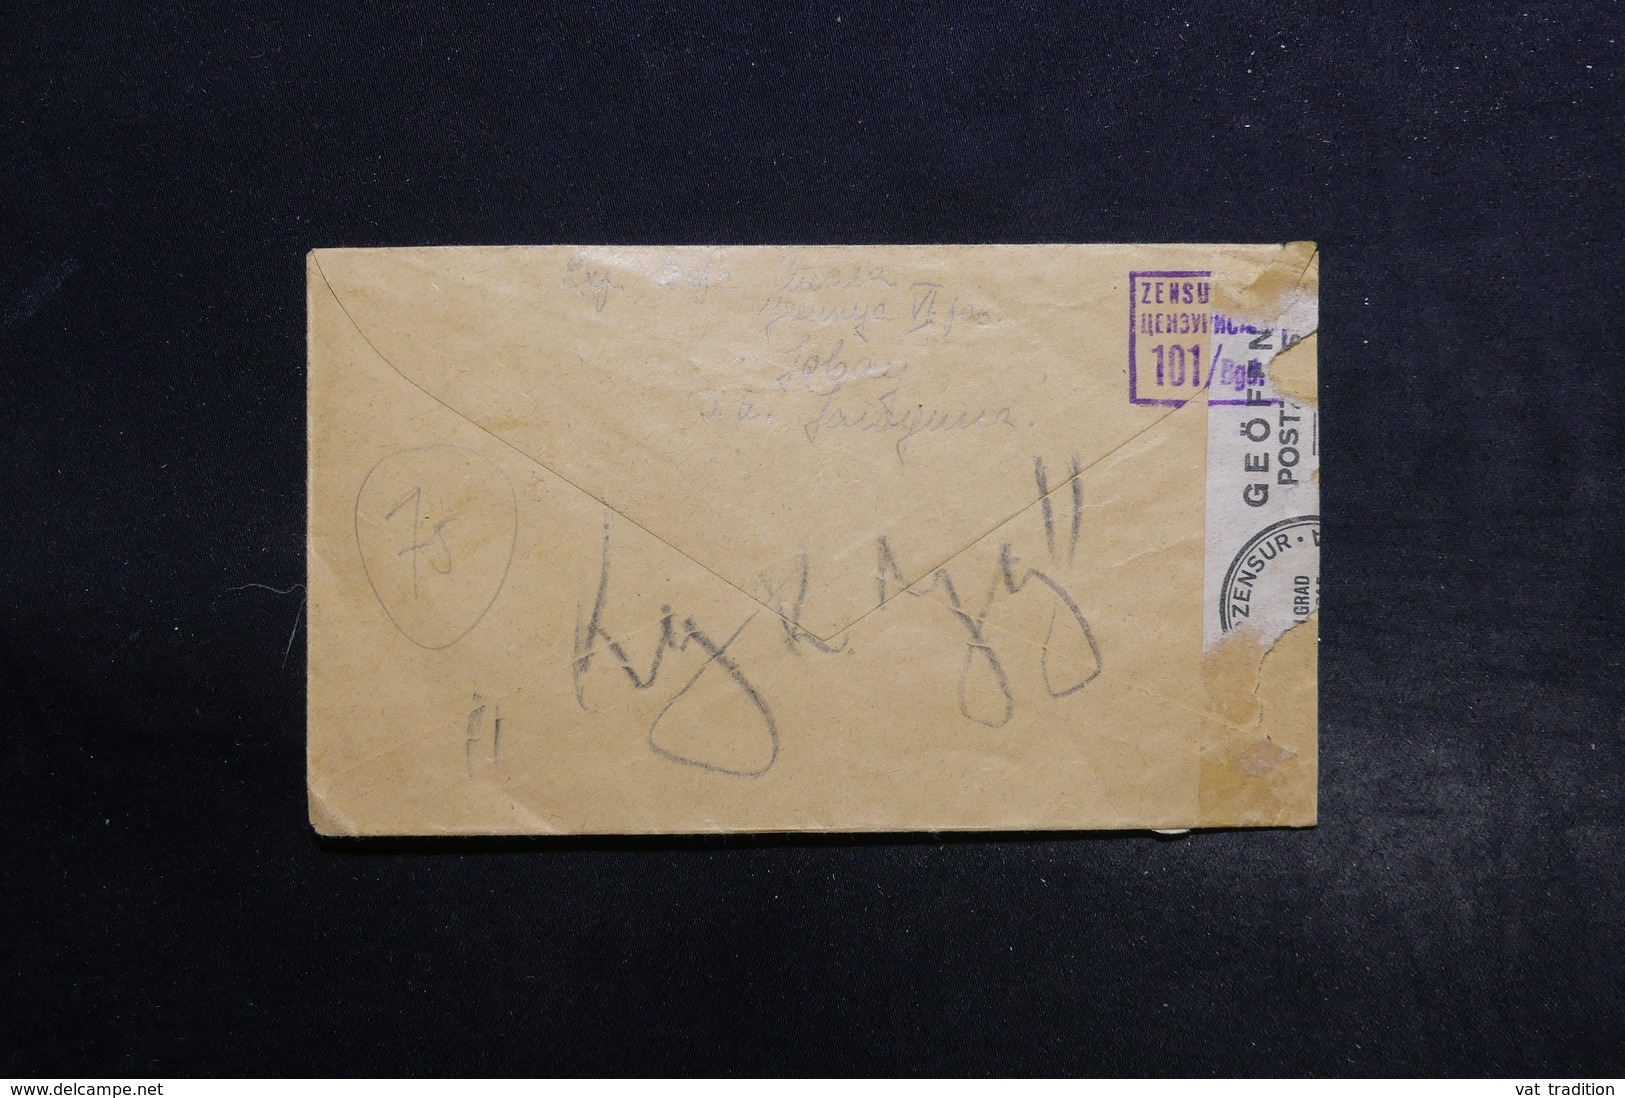 SERBIE - Enveloppe En Recommandé De Kupridja En 1943 Avec Contrôle Postal - L 28485 - Serbie